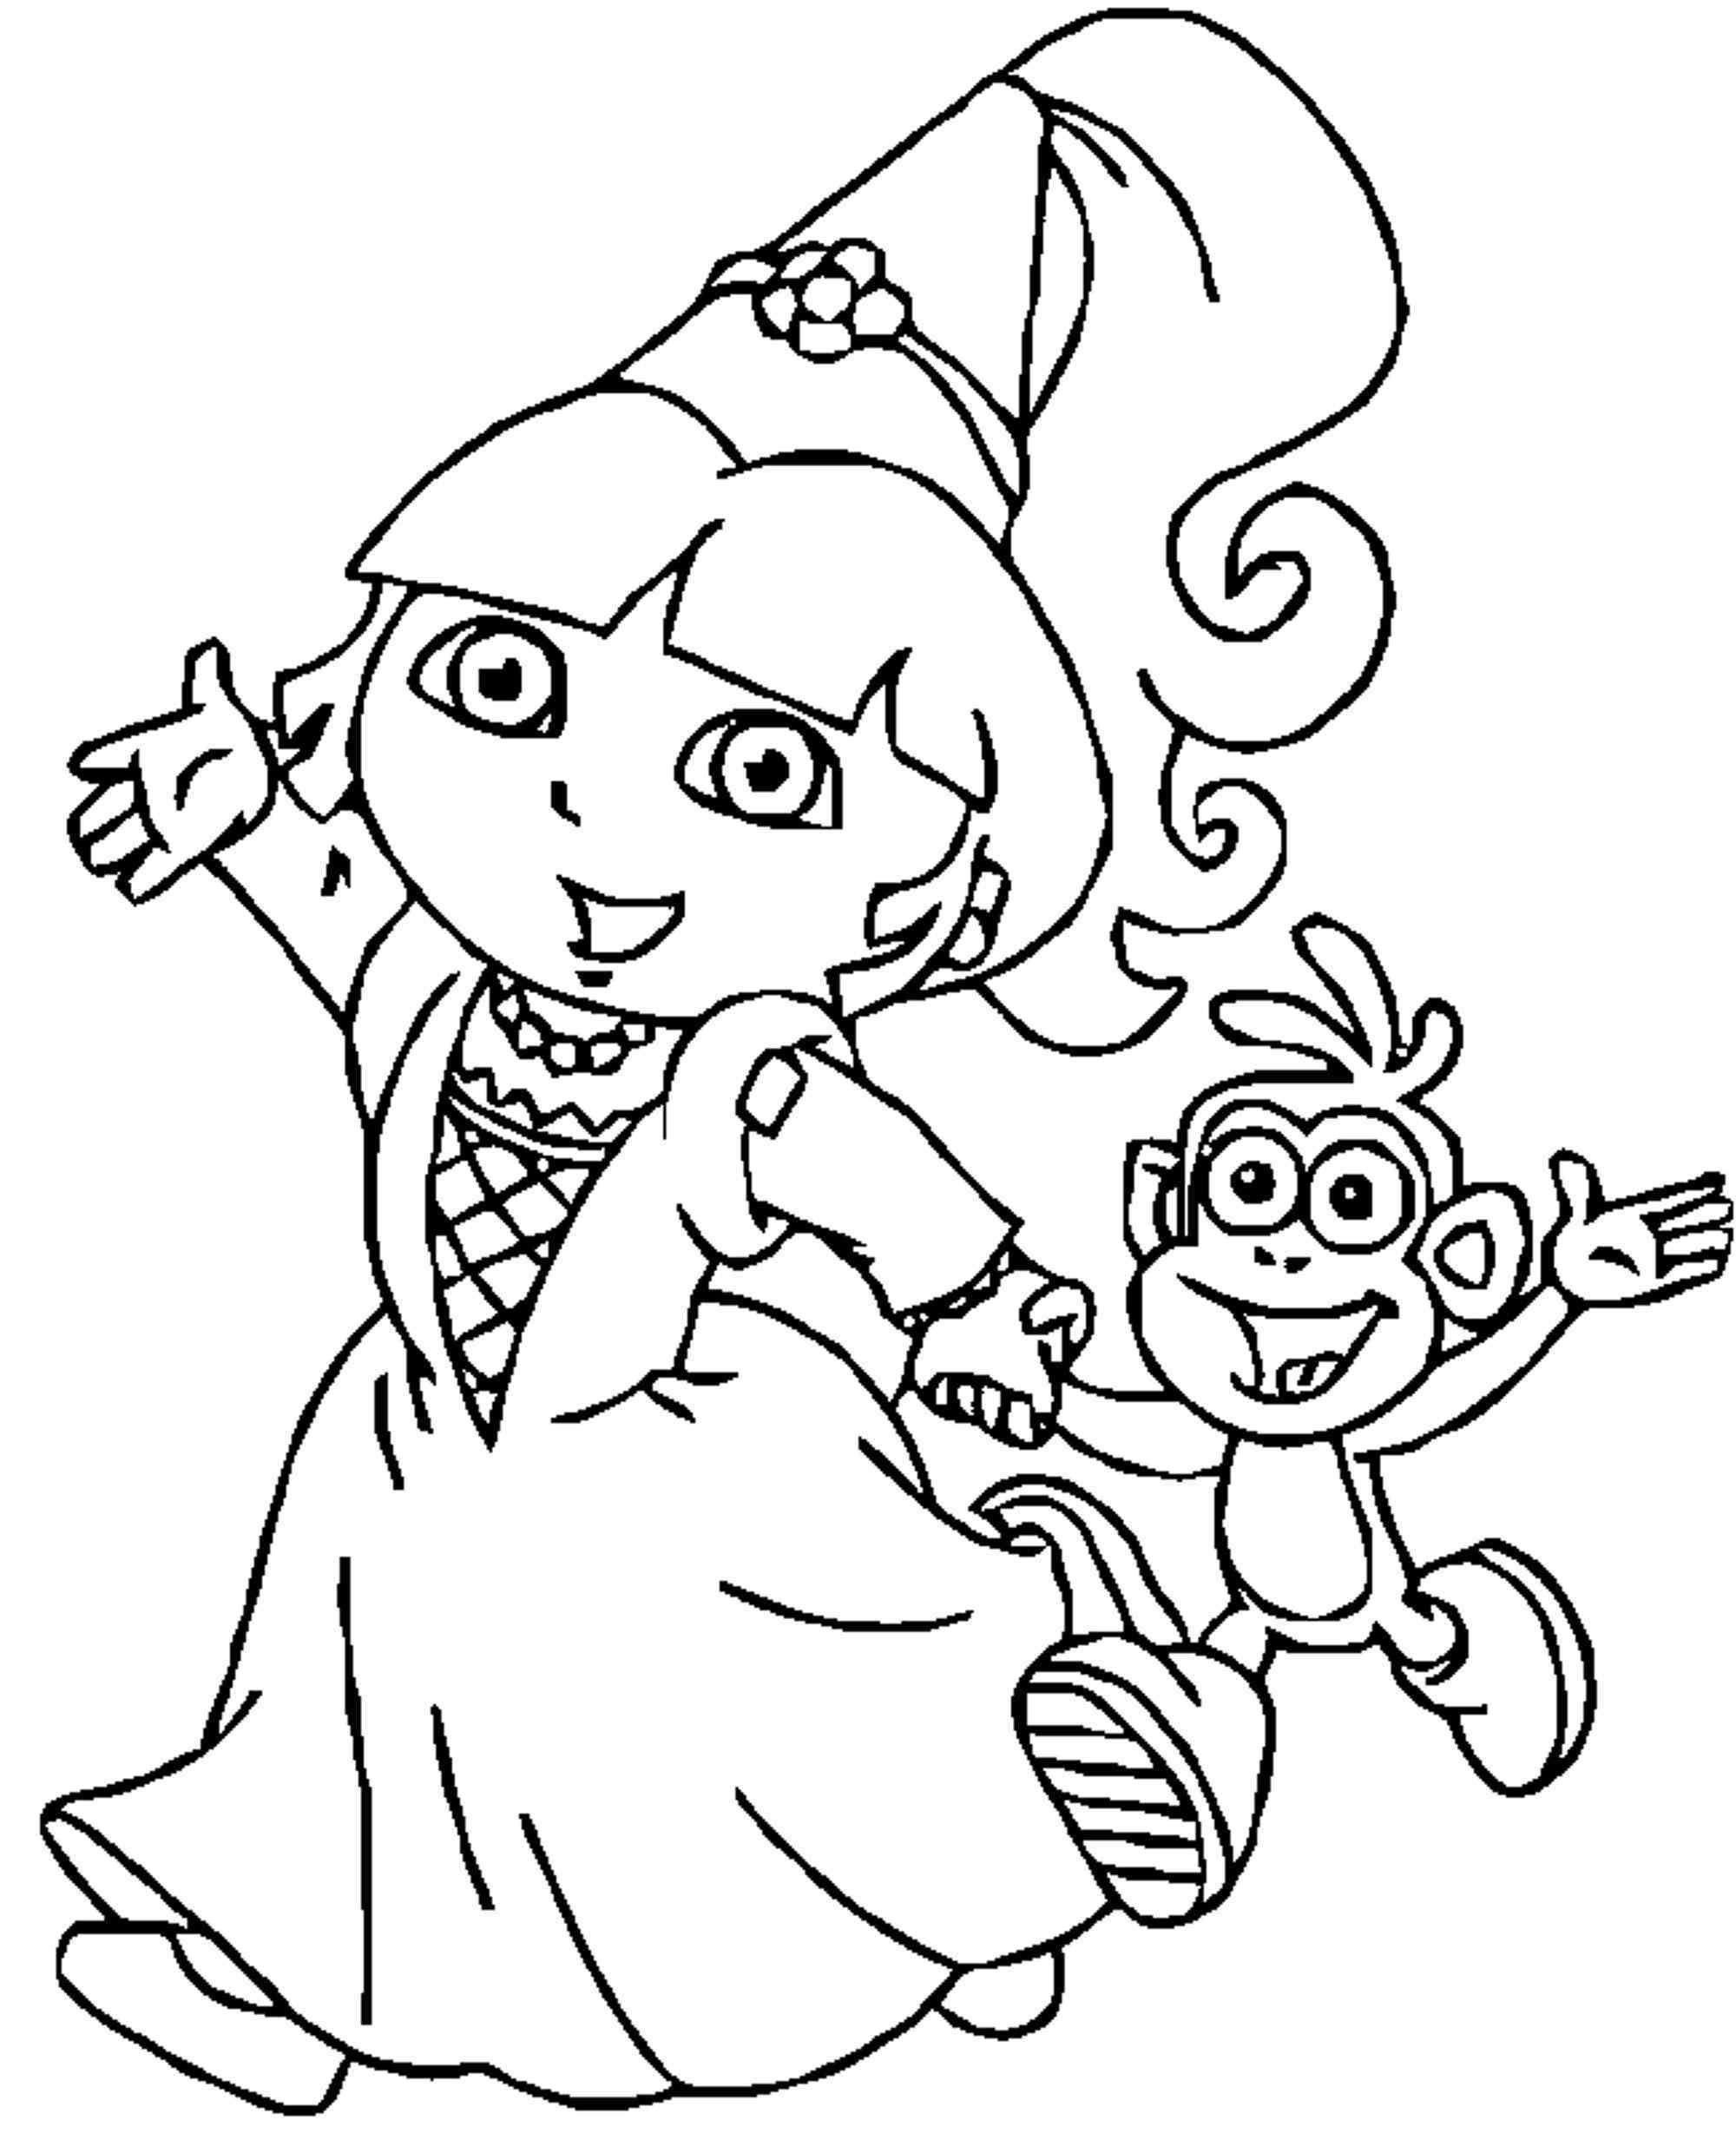 Dora Princess Printable Coloring Pages – From The Thousand intérieur Coloriage Dora Princesse